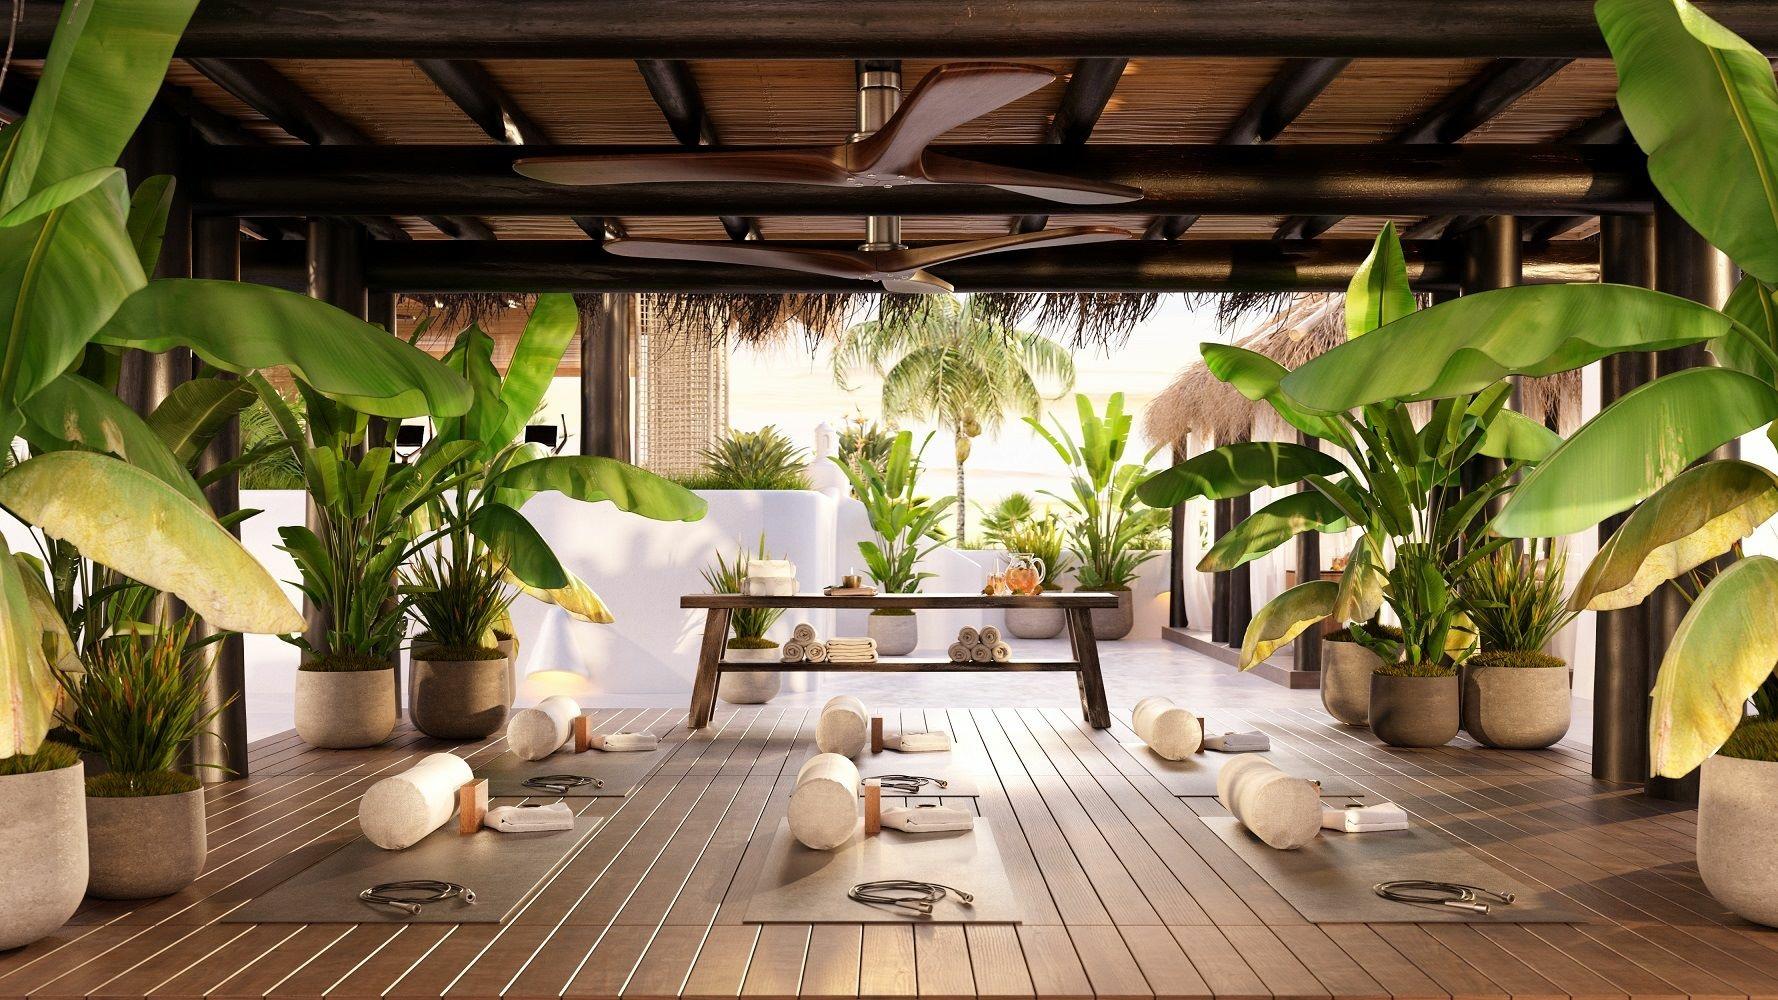 Savia proyecto cubiertas vegetales zona wellness relax yoga